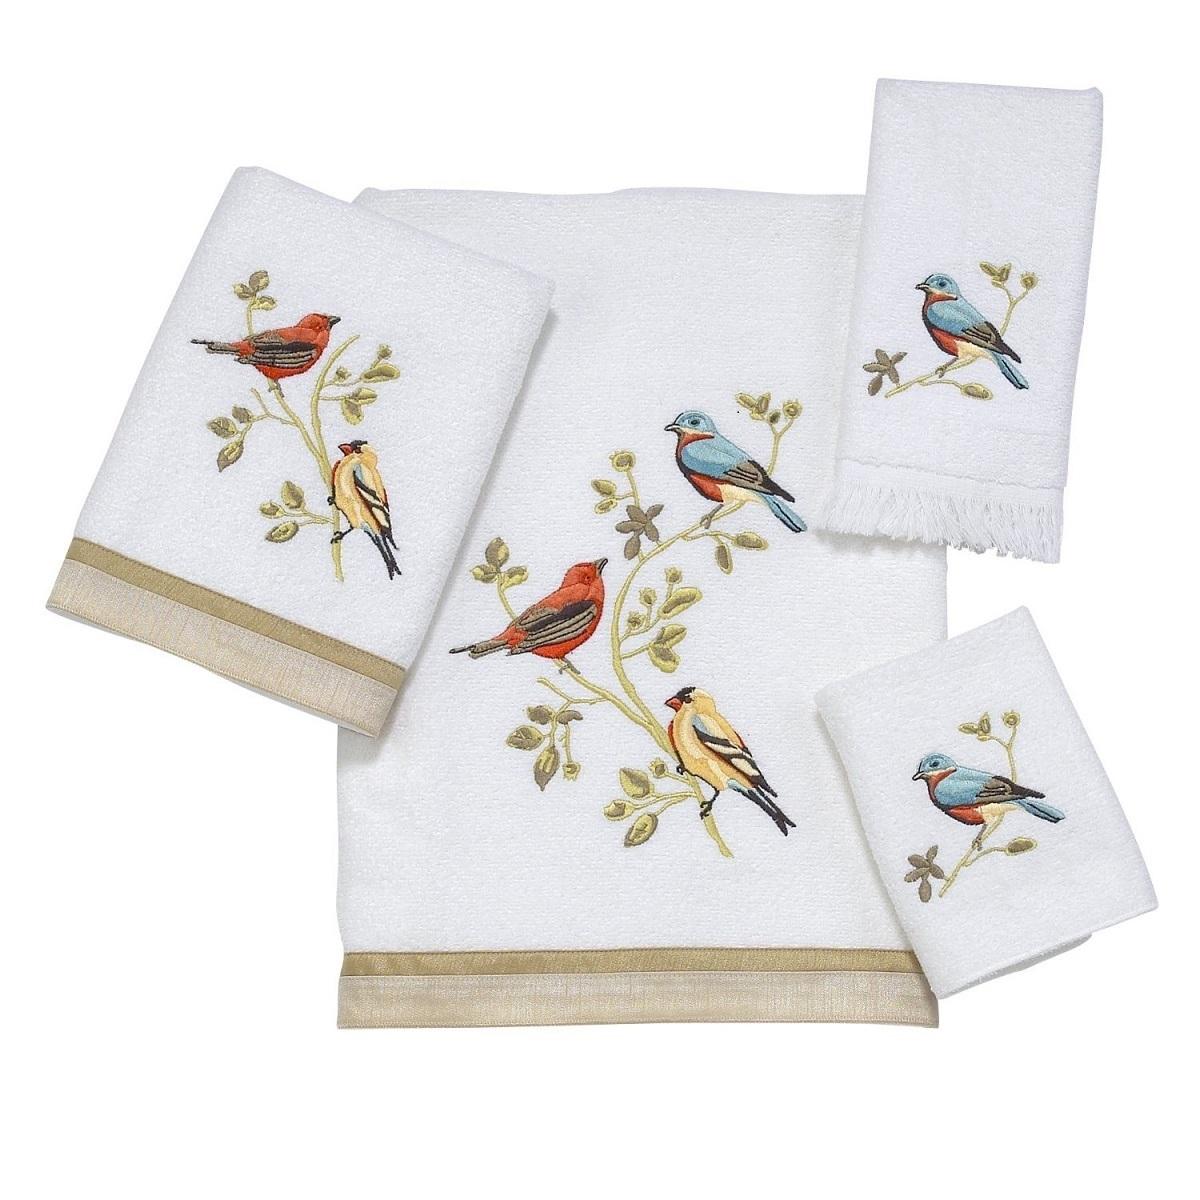 Полотенца Полотенце 69х127 Avanti Gilded Birds белое elitnoe-polotentse-mahrovoe-gilded-birds-beloe-ot-avanti-kanada.jpg